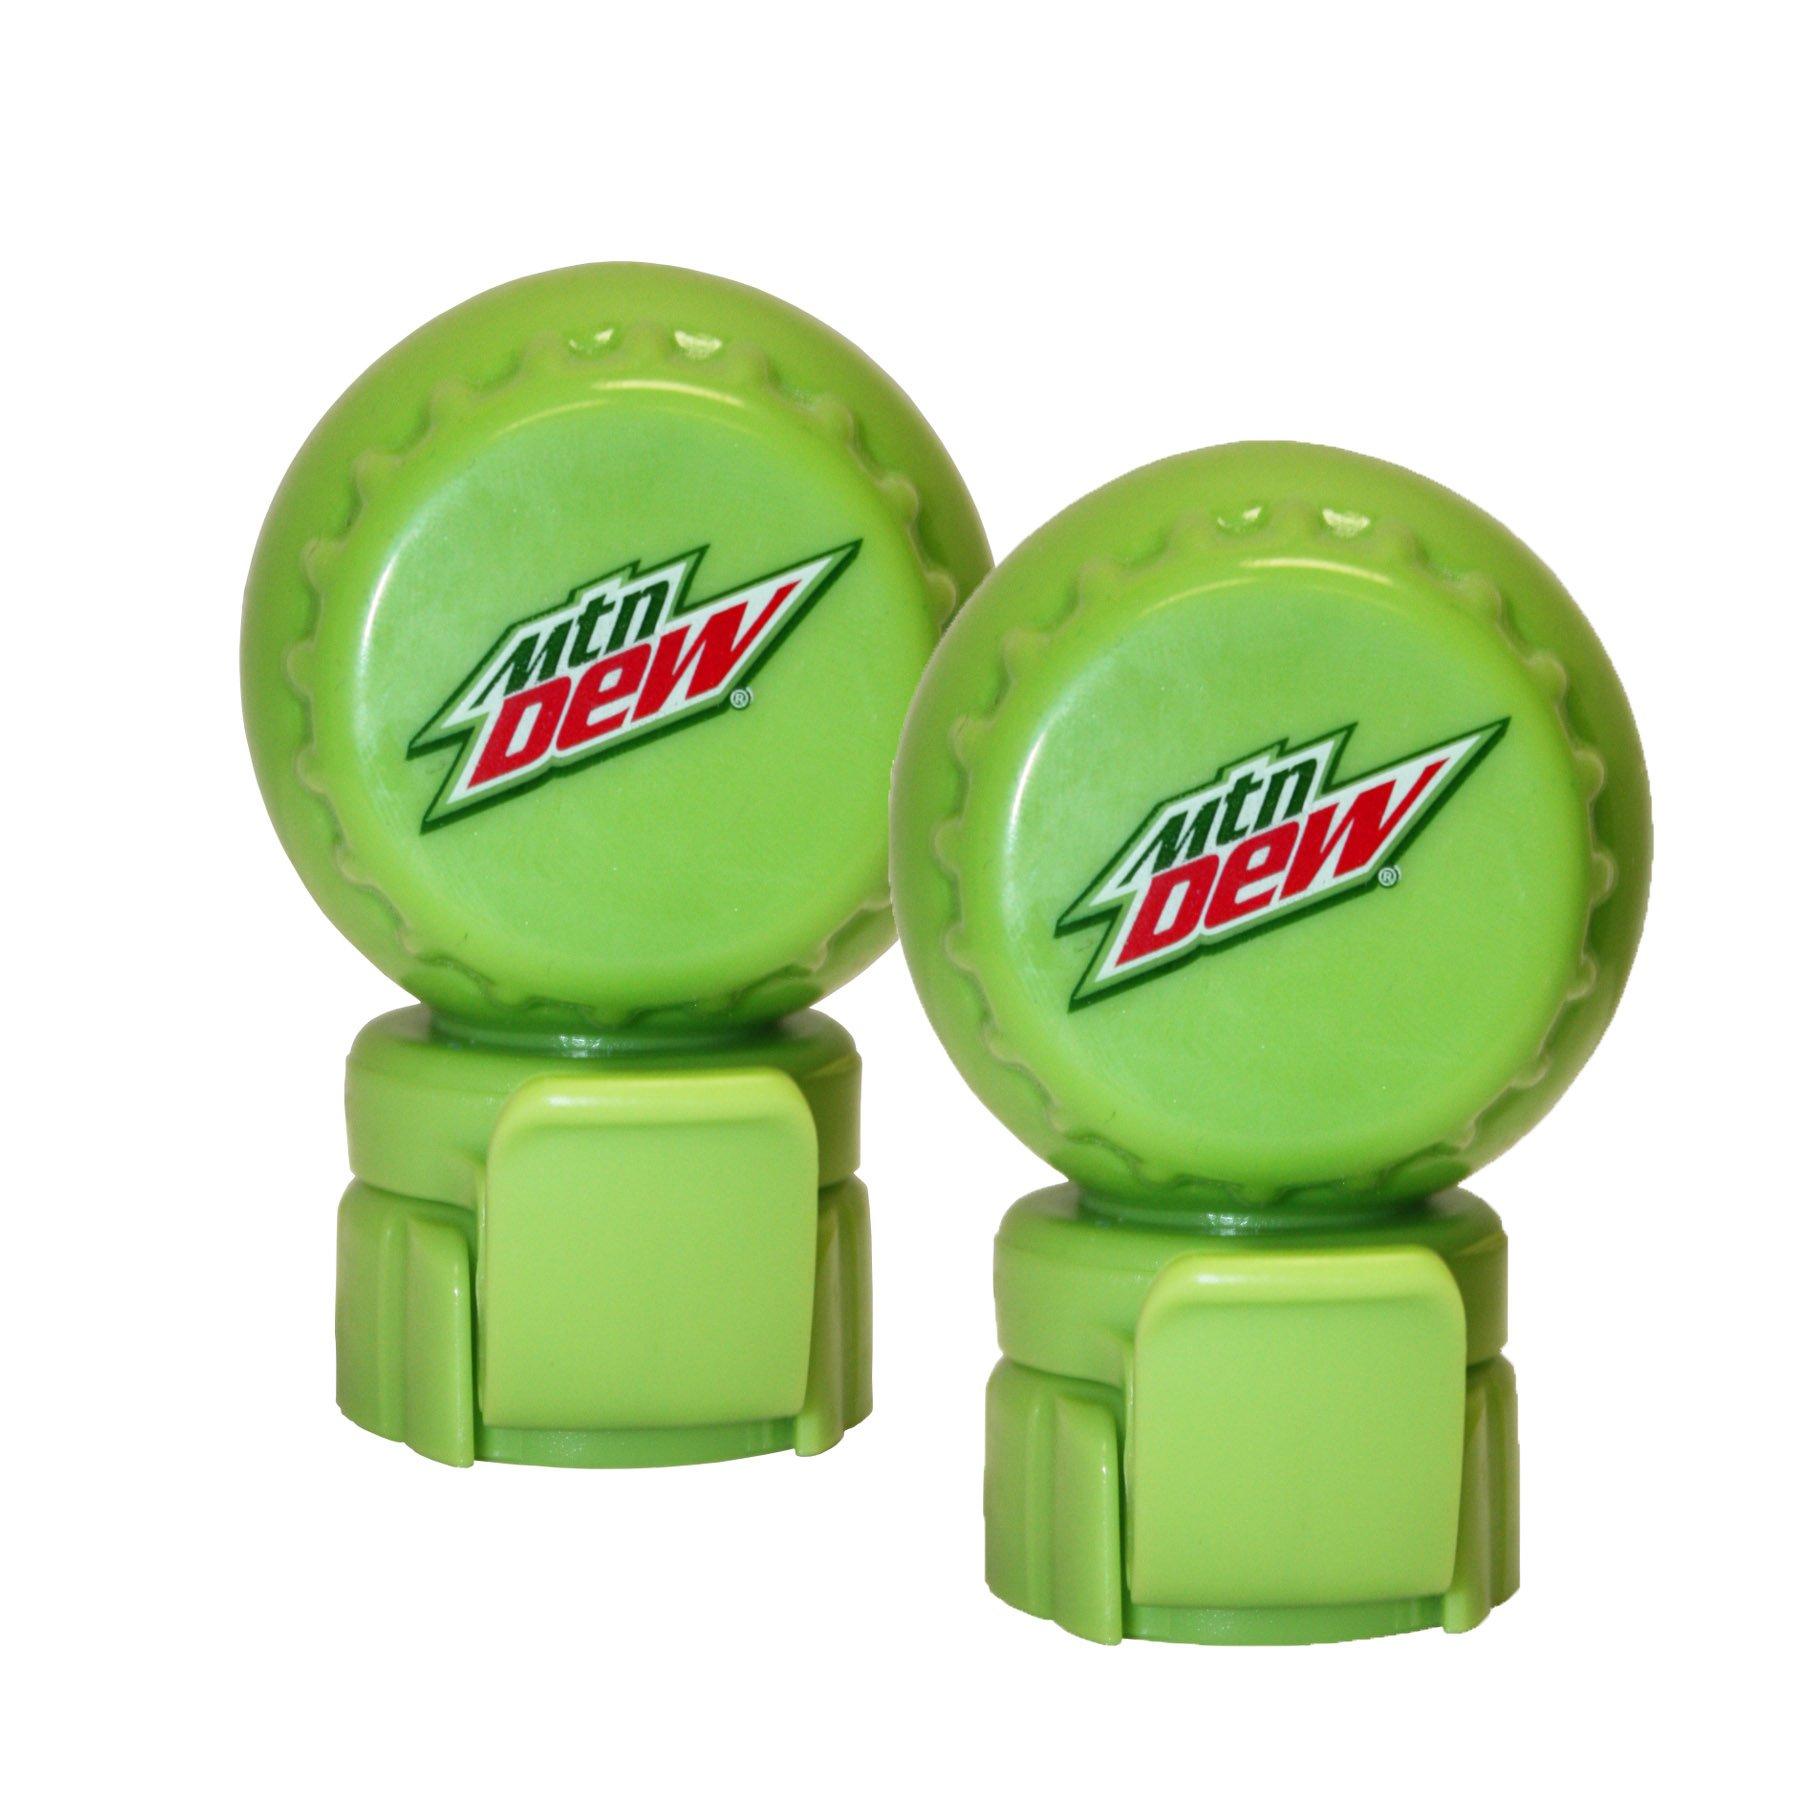 Jokari 2 Count Mtn Dew Modern Logo Fizz Keeper Soda Bottle Pump and Pour Caps, Green